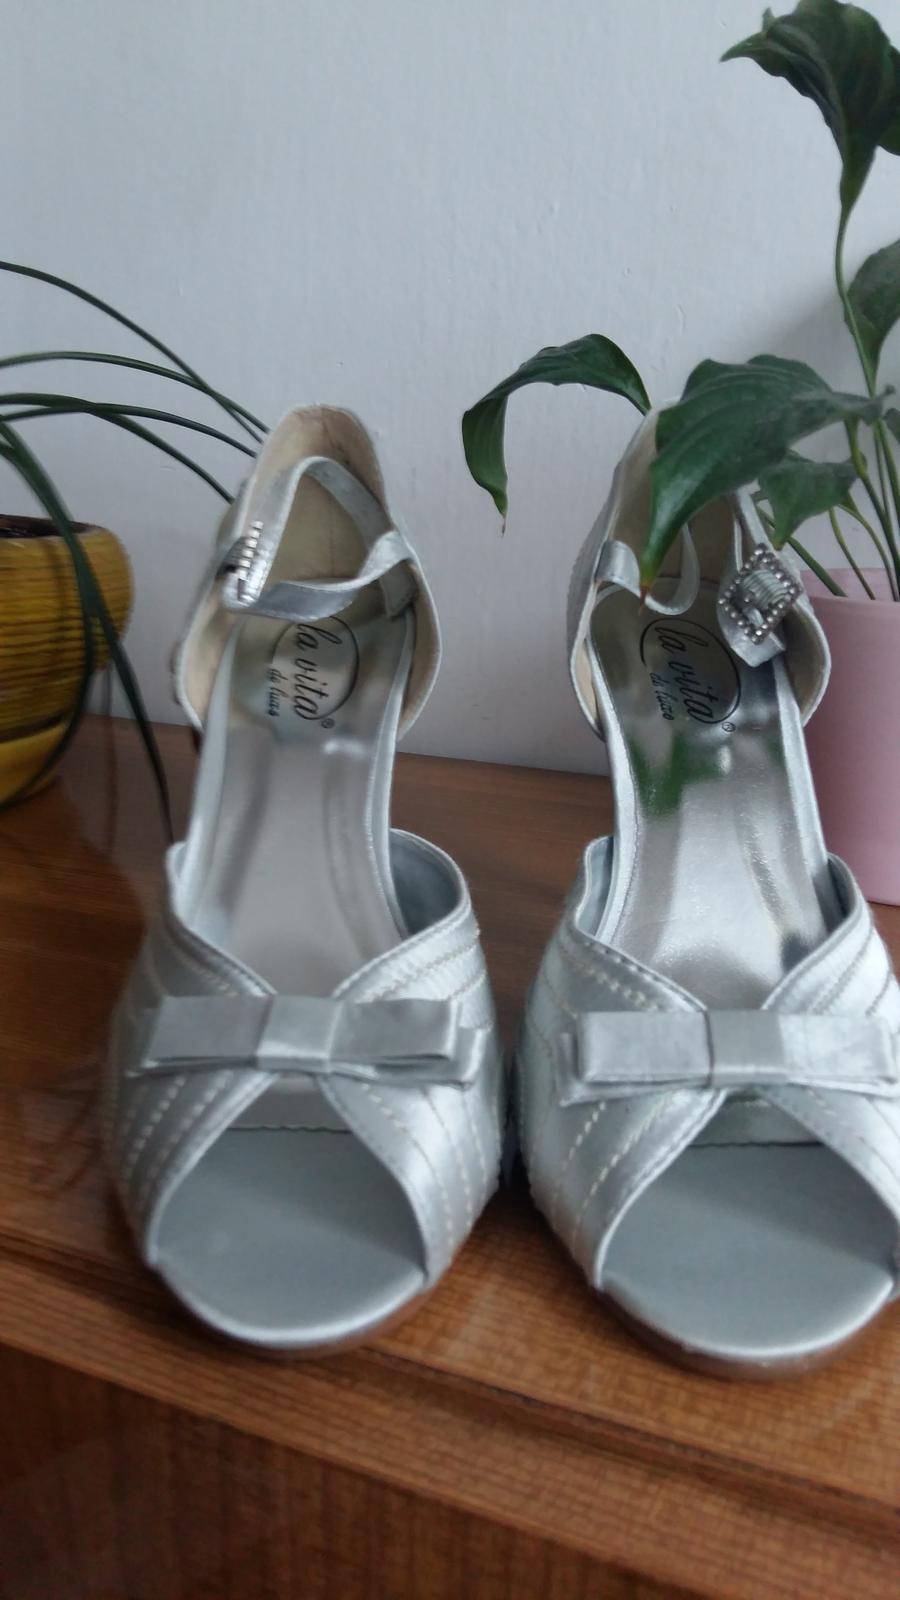 3f93fd94ea Strieborné topánky nepoužité